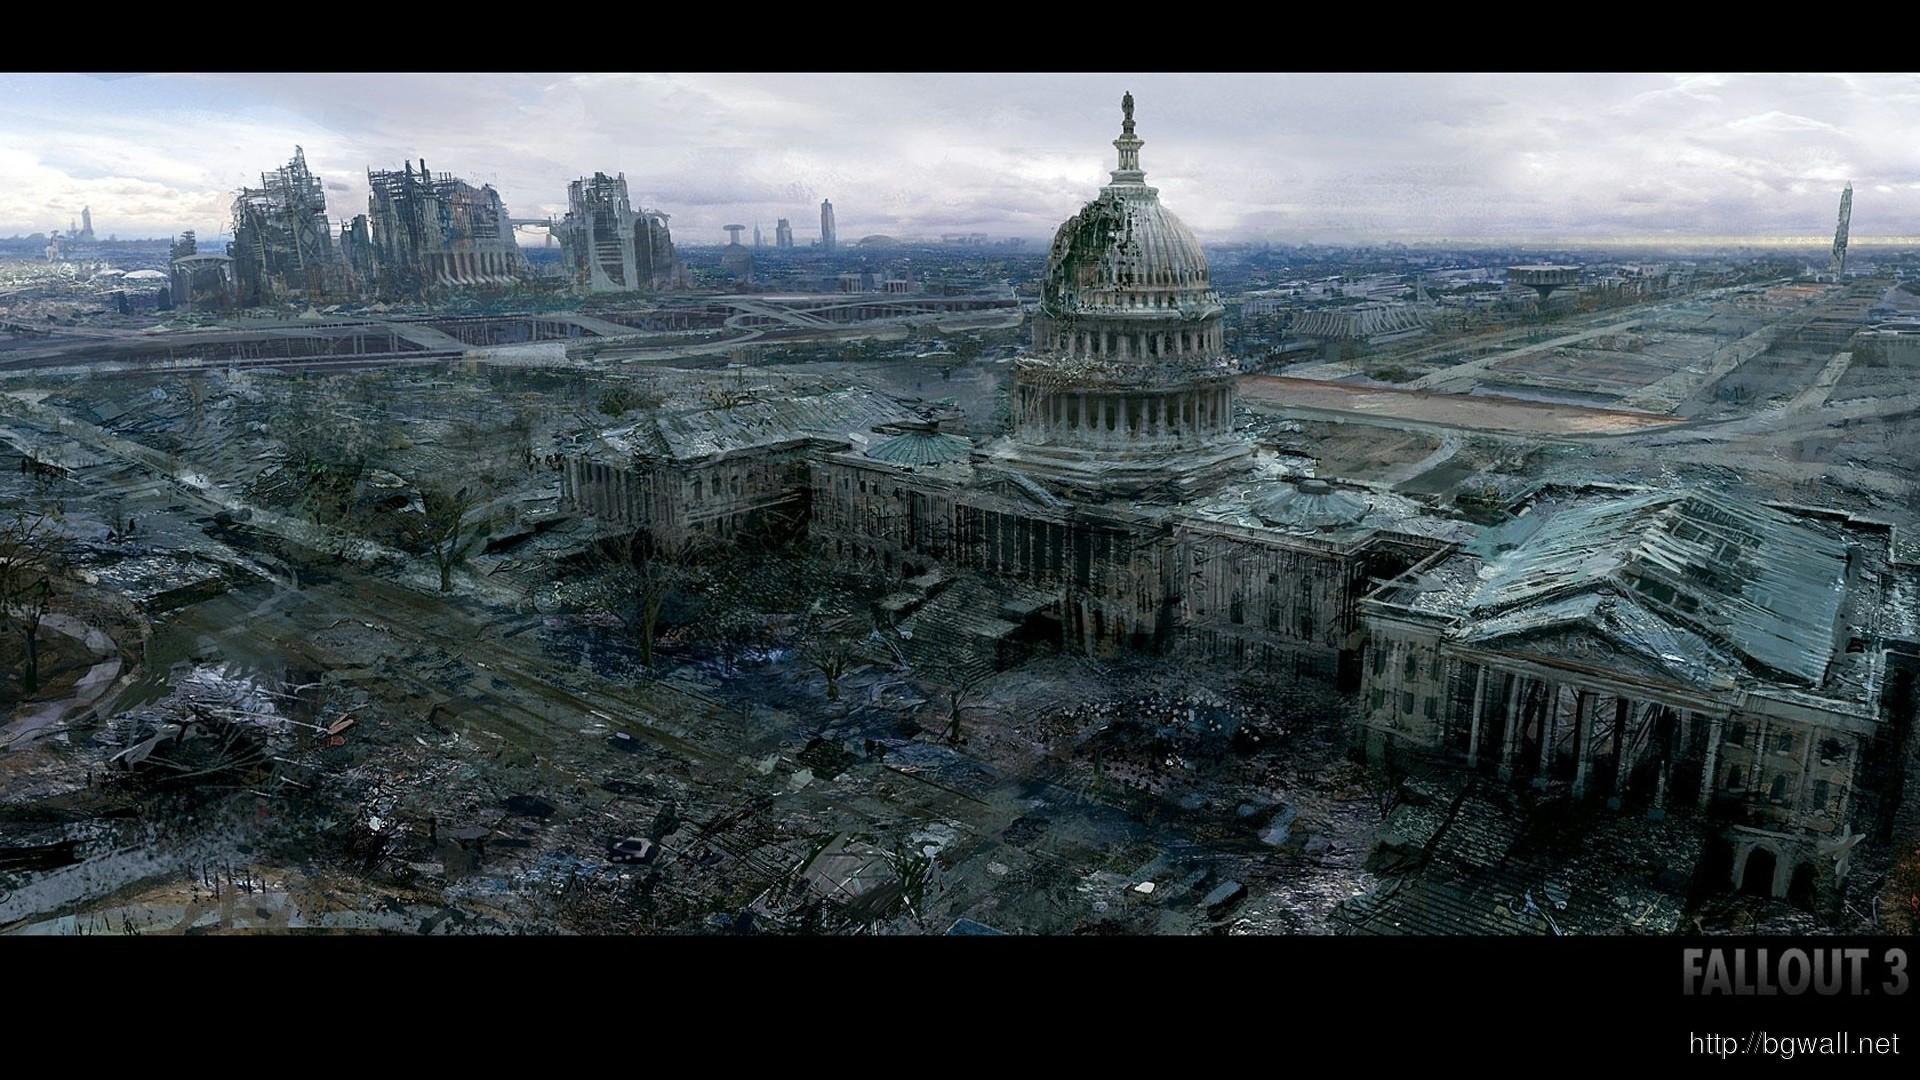 Res: 1920x1080, Fallout 3 City Desktop Wallpapers